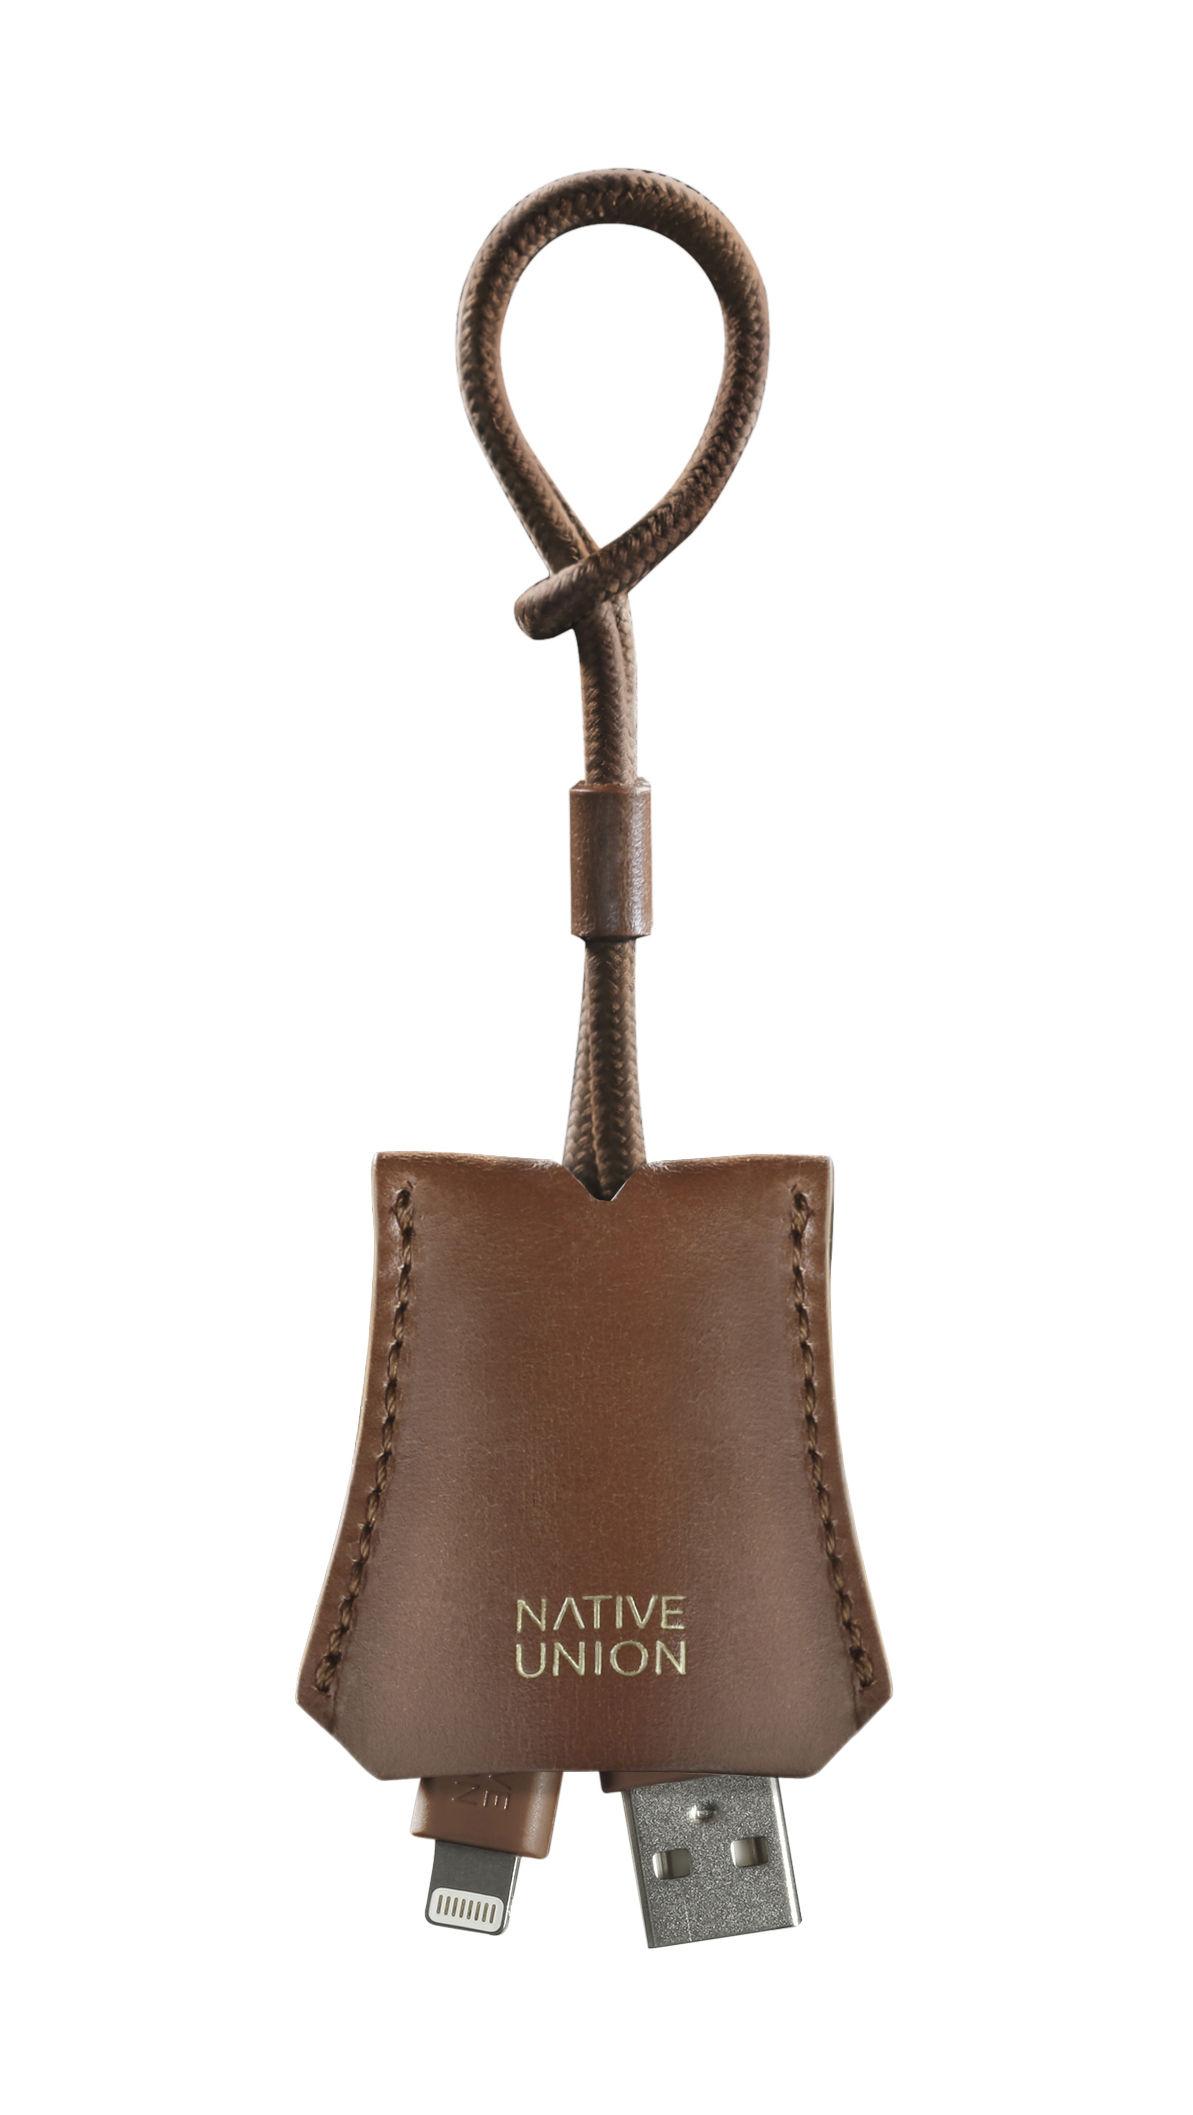 Accessoires - Technik - Tag Ladekabel / Apple-Lightning auf USB - für Schlüsselanhänger - Native Union - Cognac - Cuir véritable, Nylon